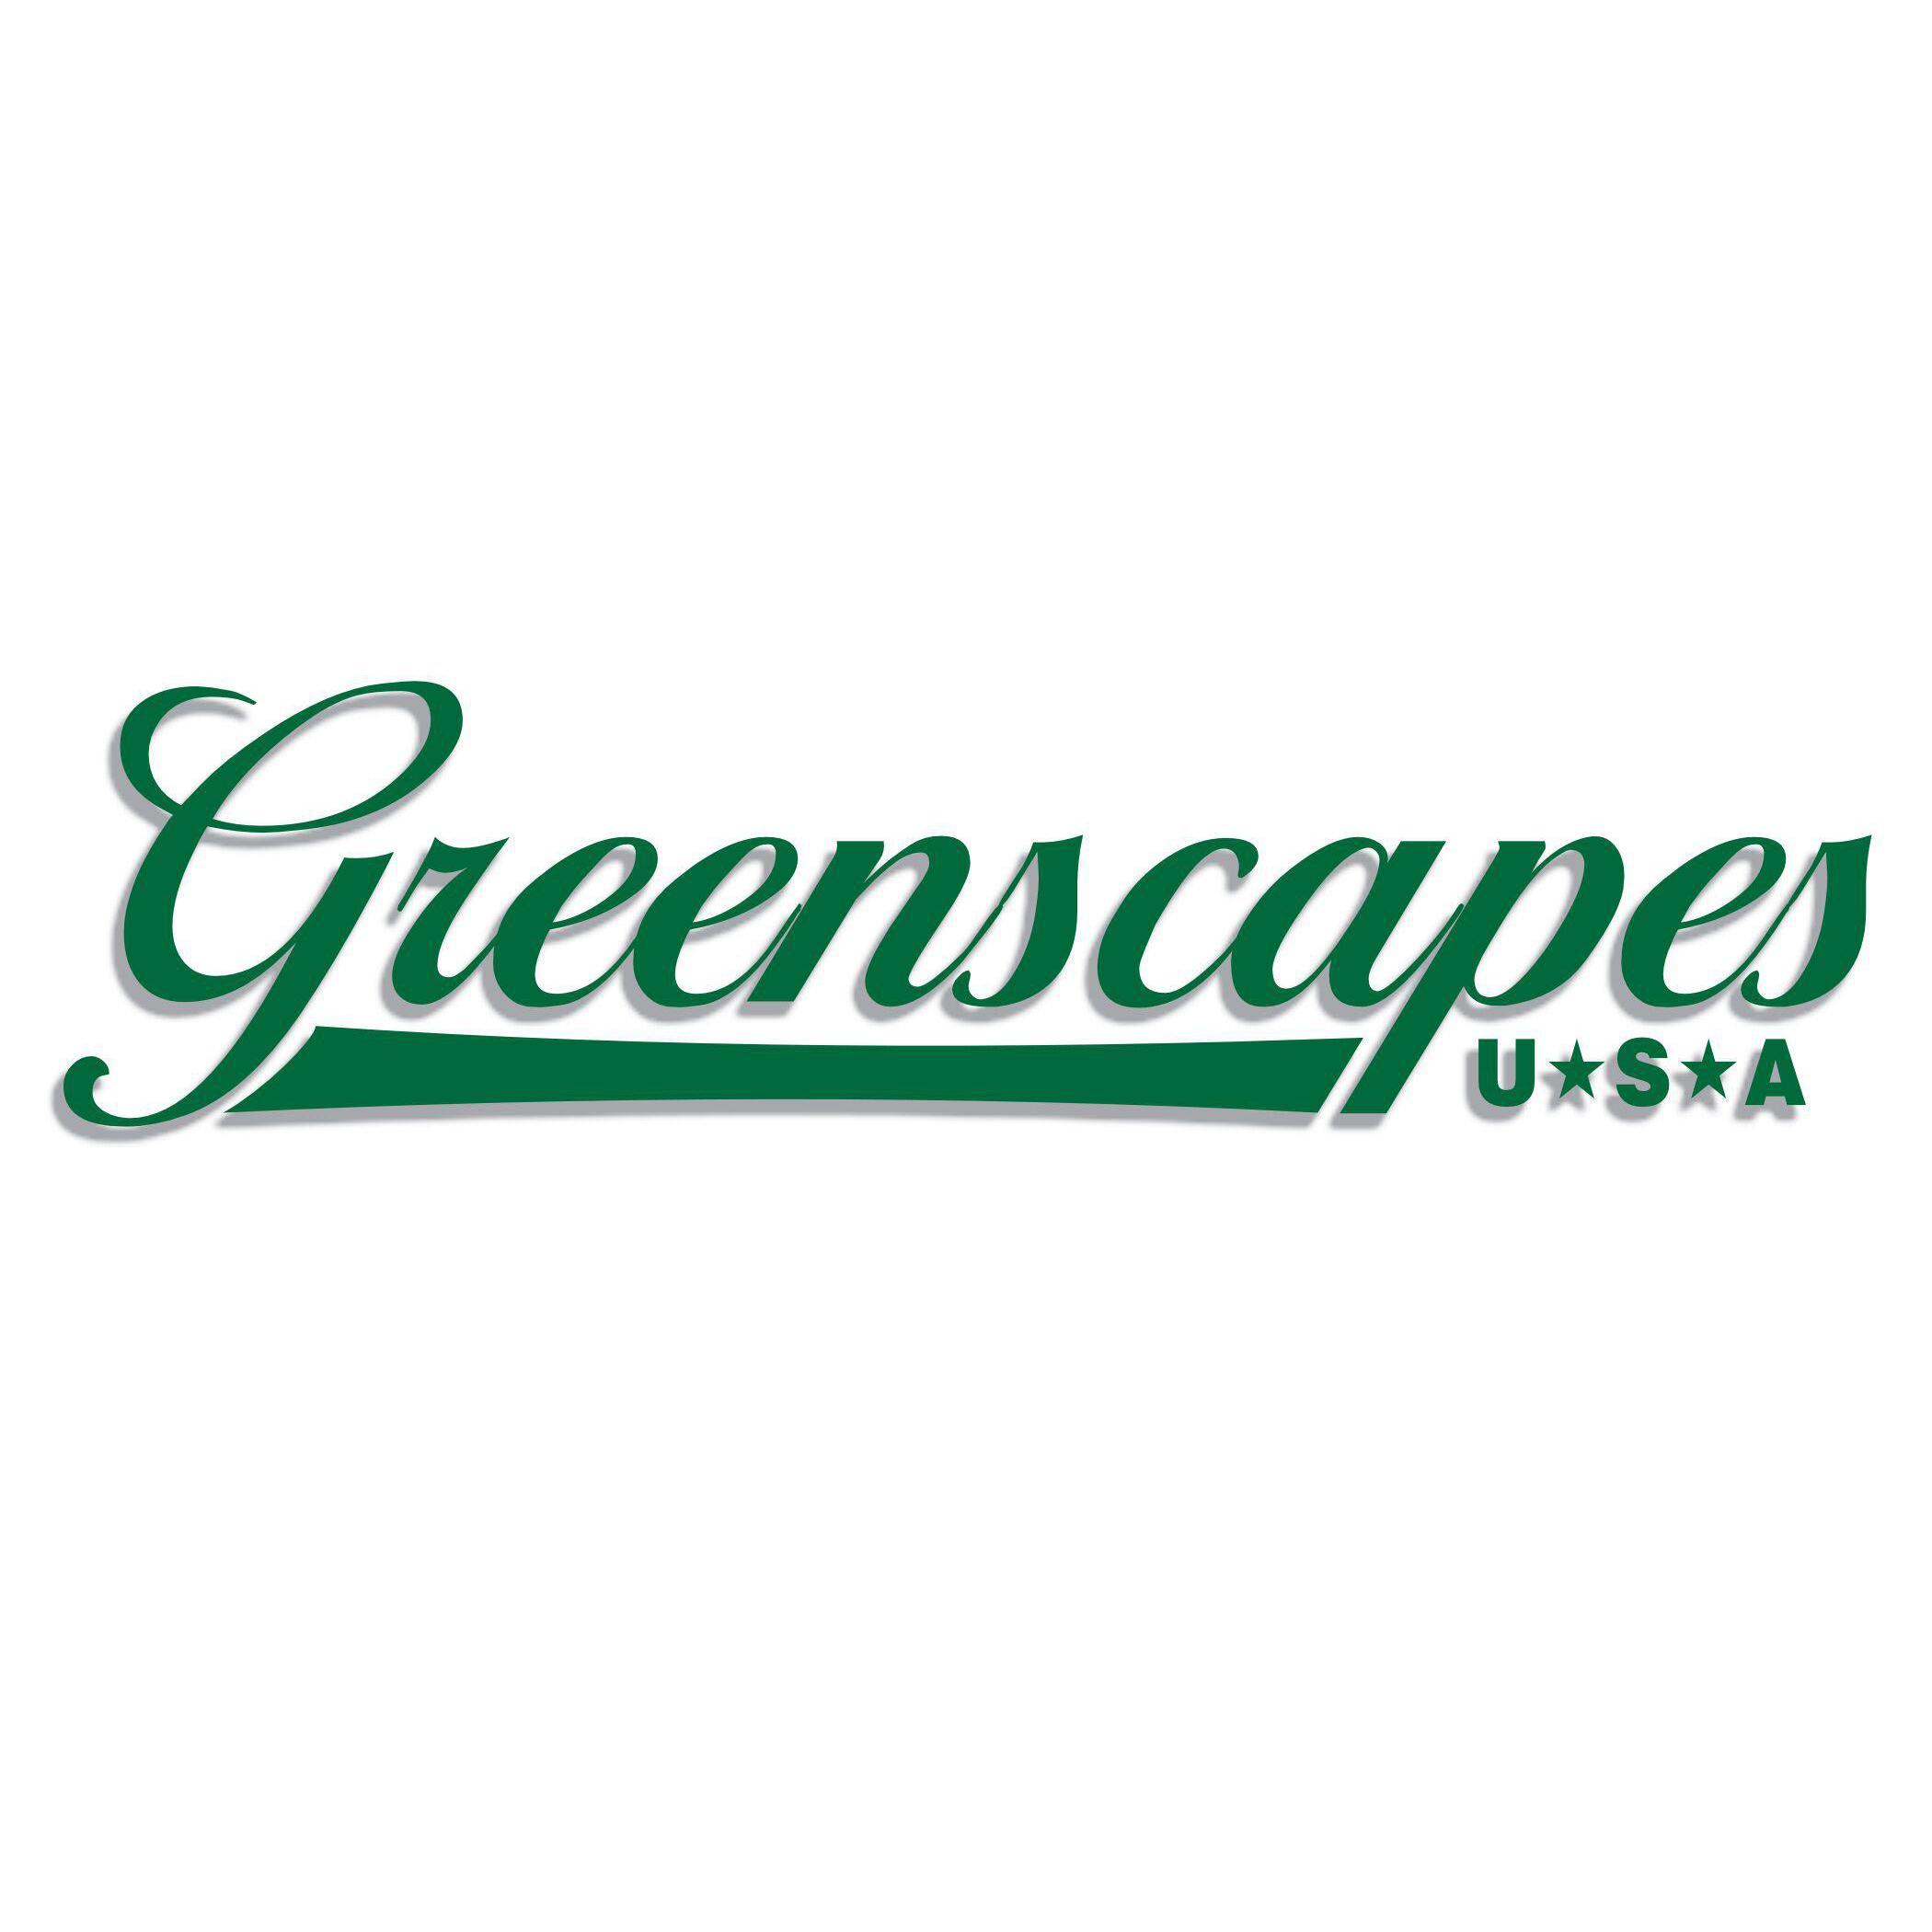 Greenscapes USA